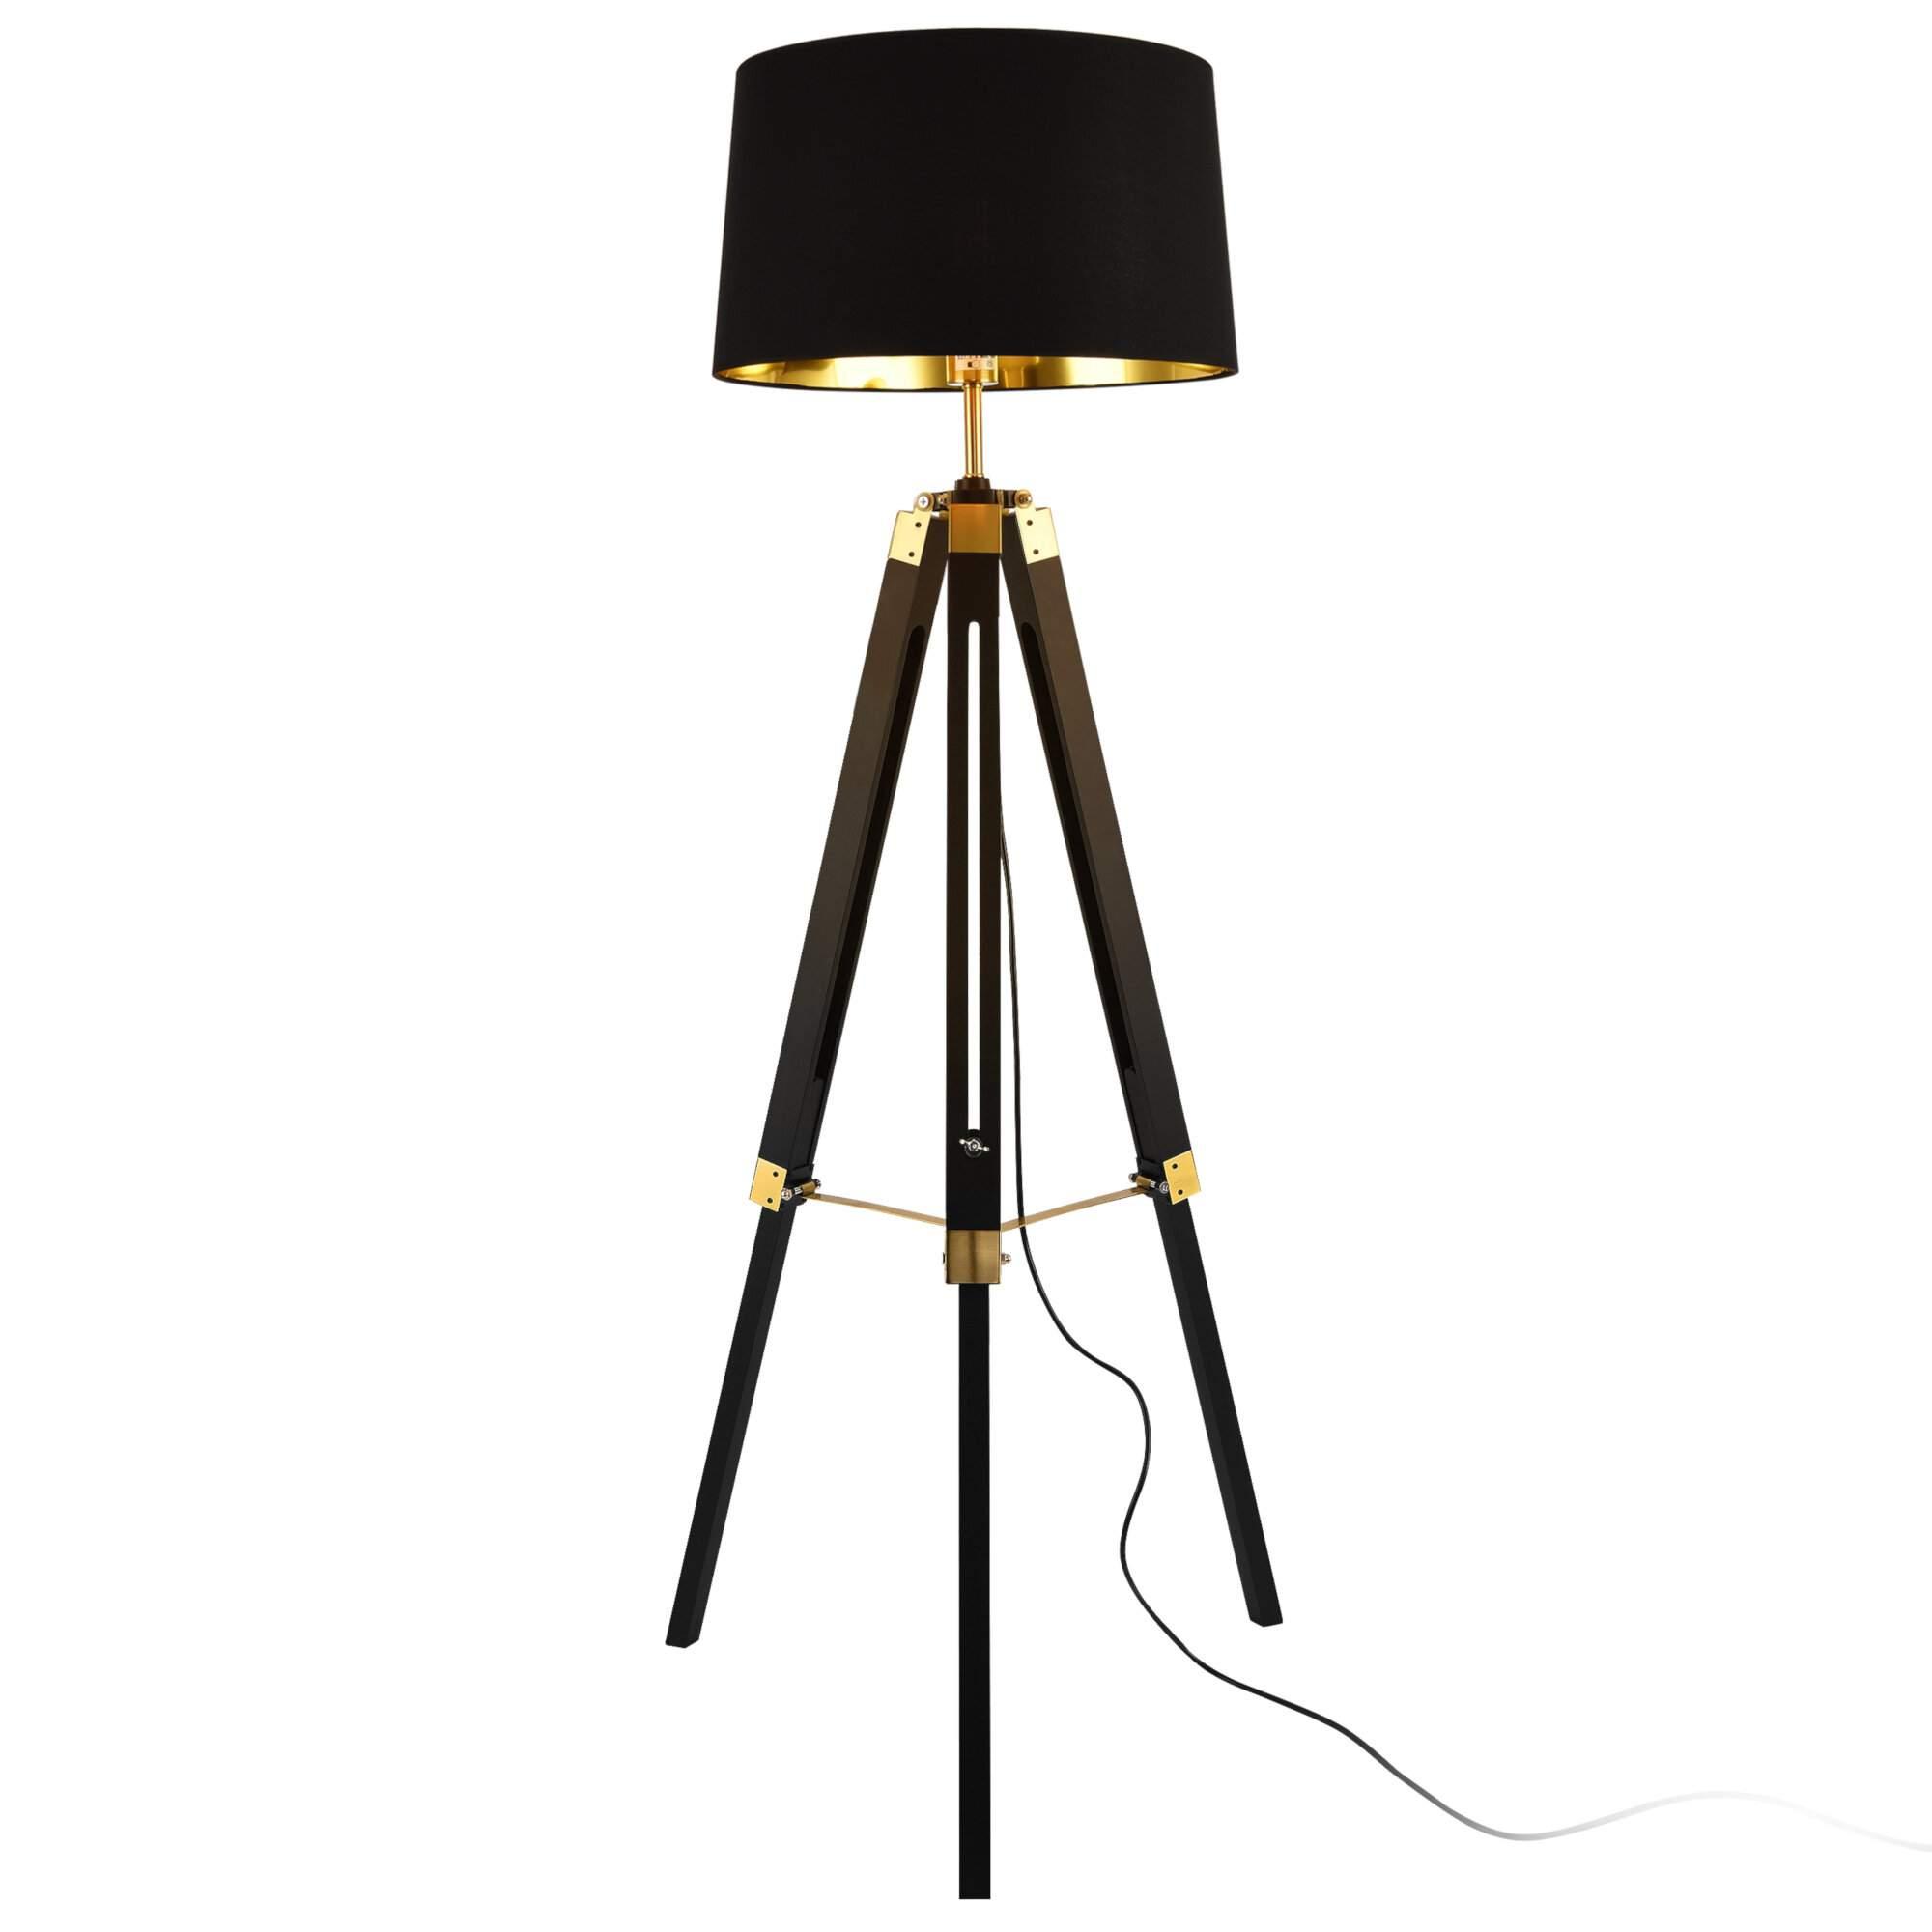 145 cm tripod stehlampe bierce